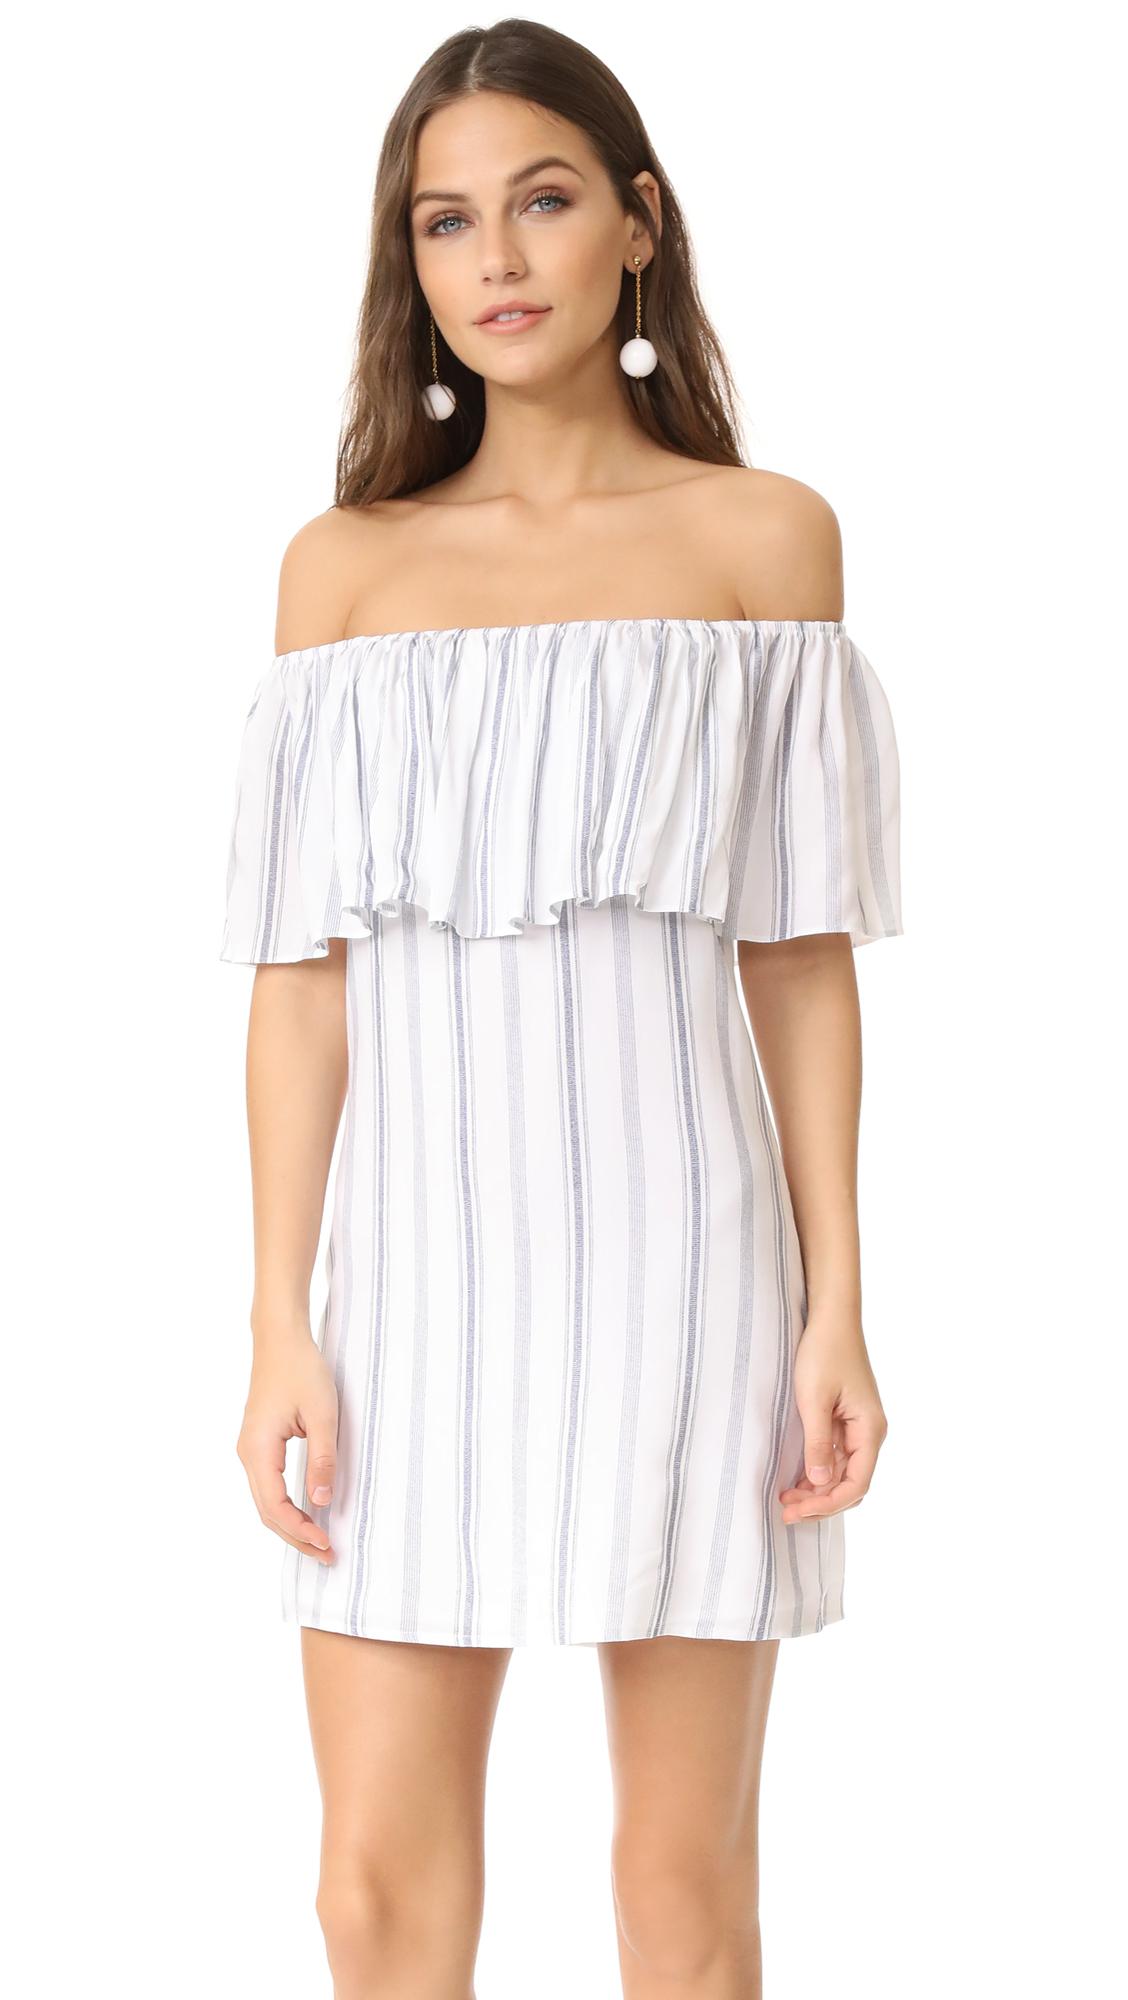 Roe + May Ravello Mini Dress - Hartford Stripe